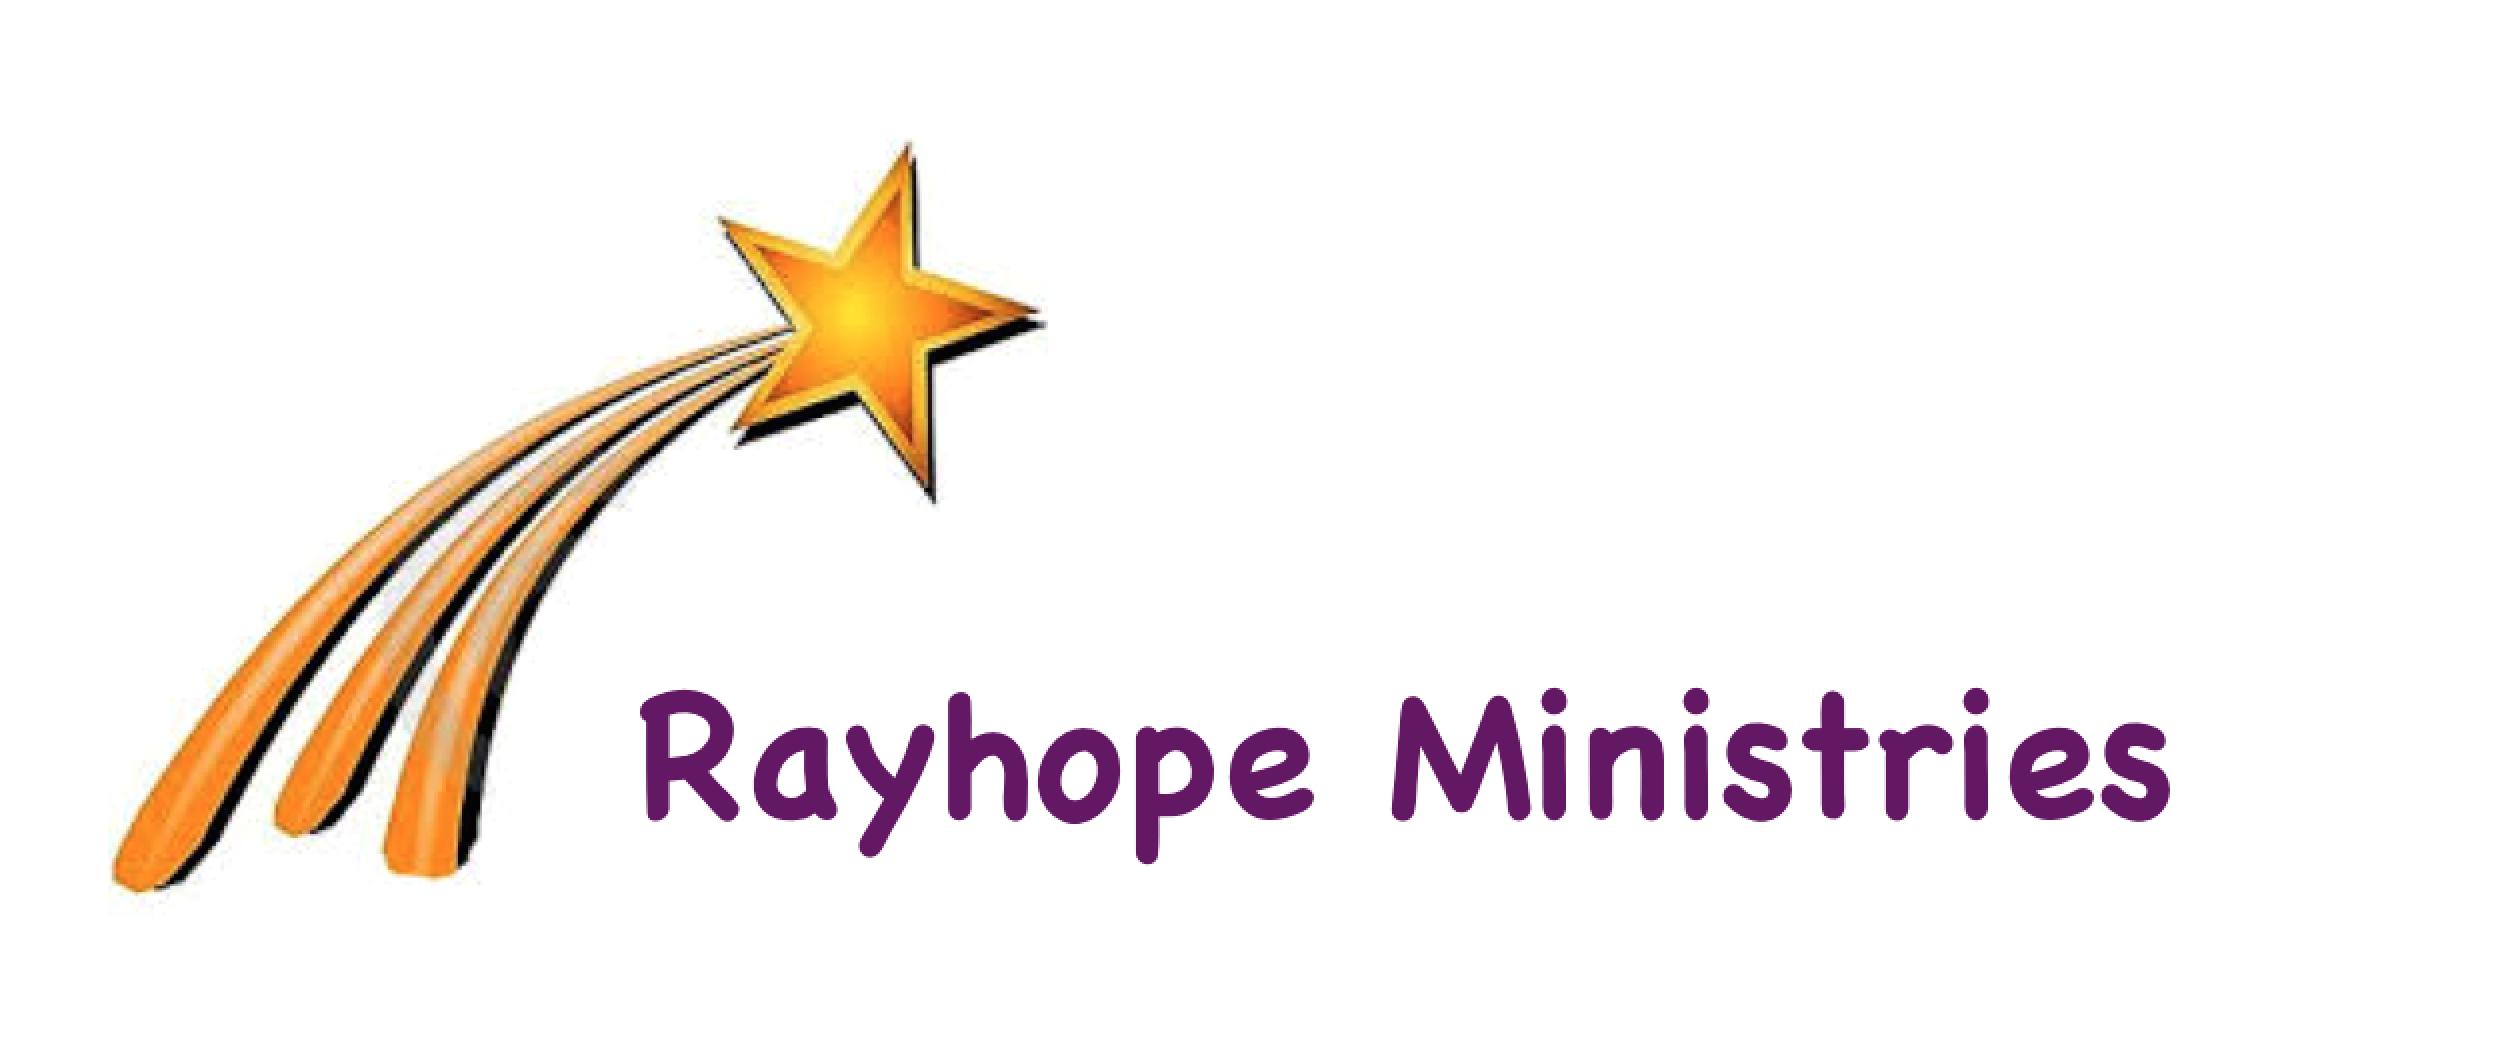 Rayhope Ministries